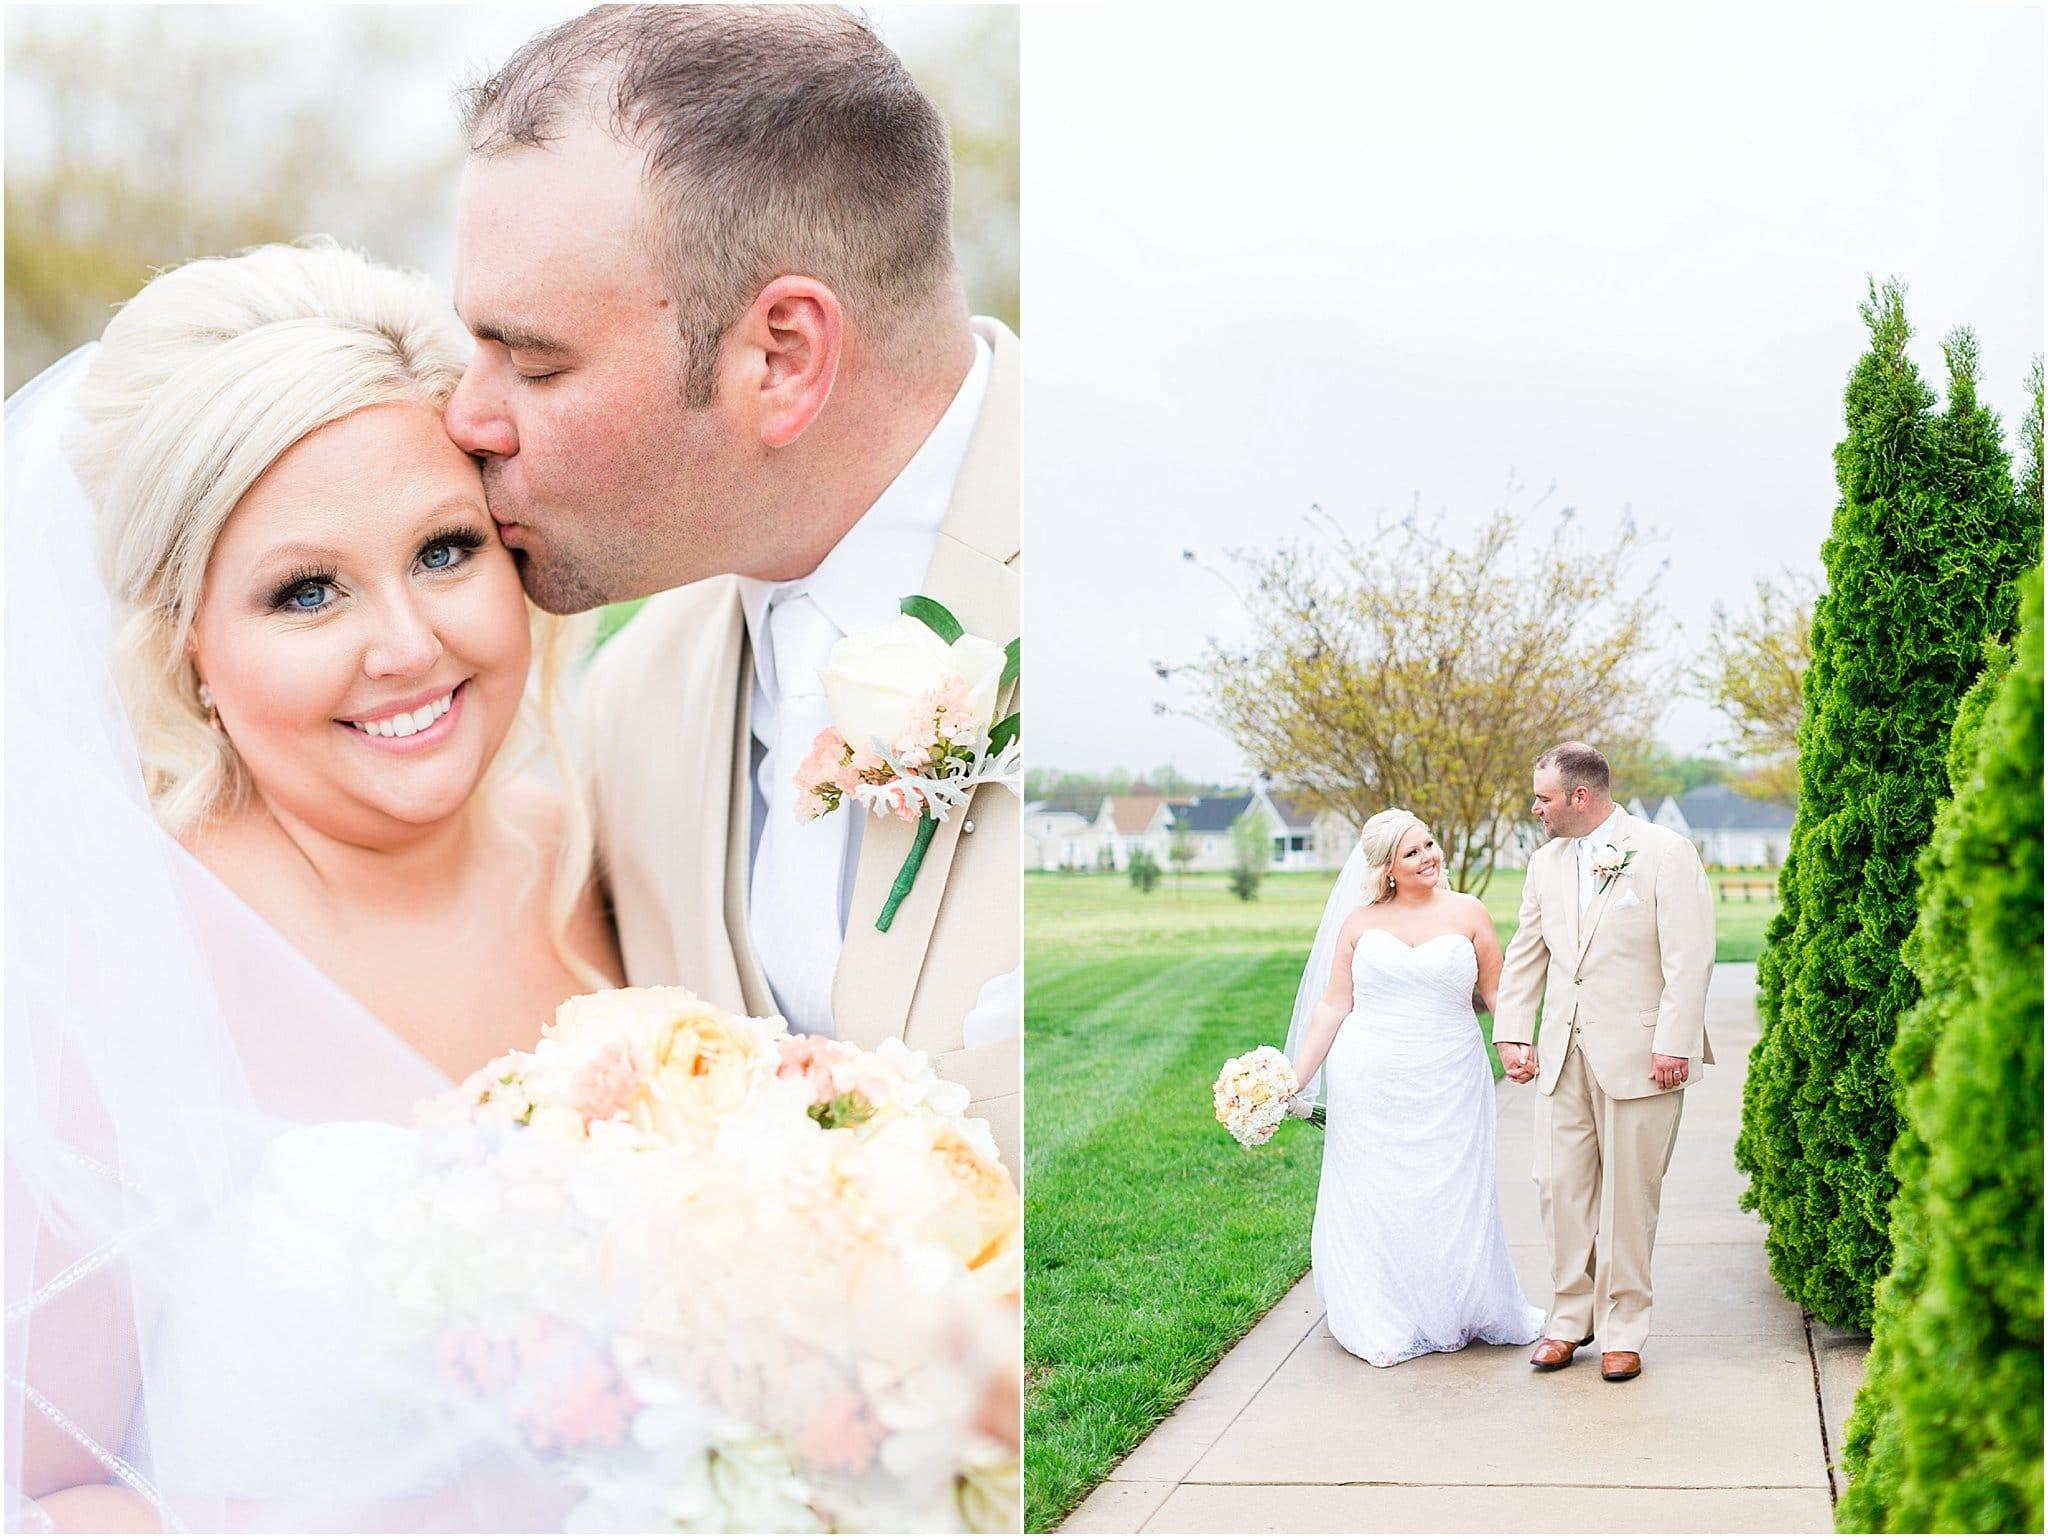 jessscott-milsboro-delaware-wedding-cassidymrphotography_0057